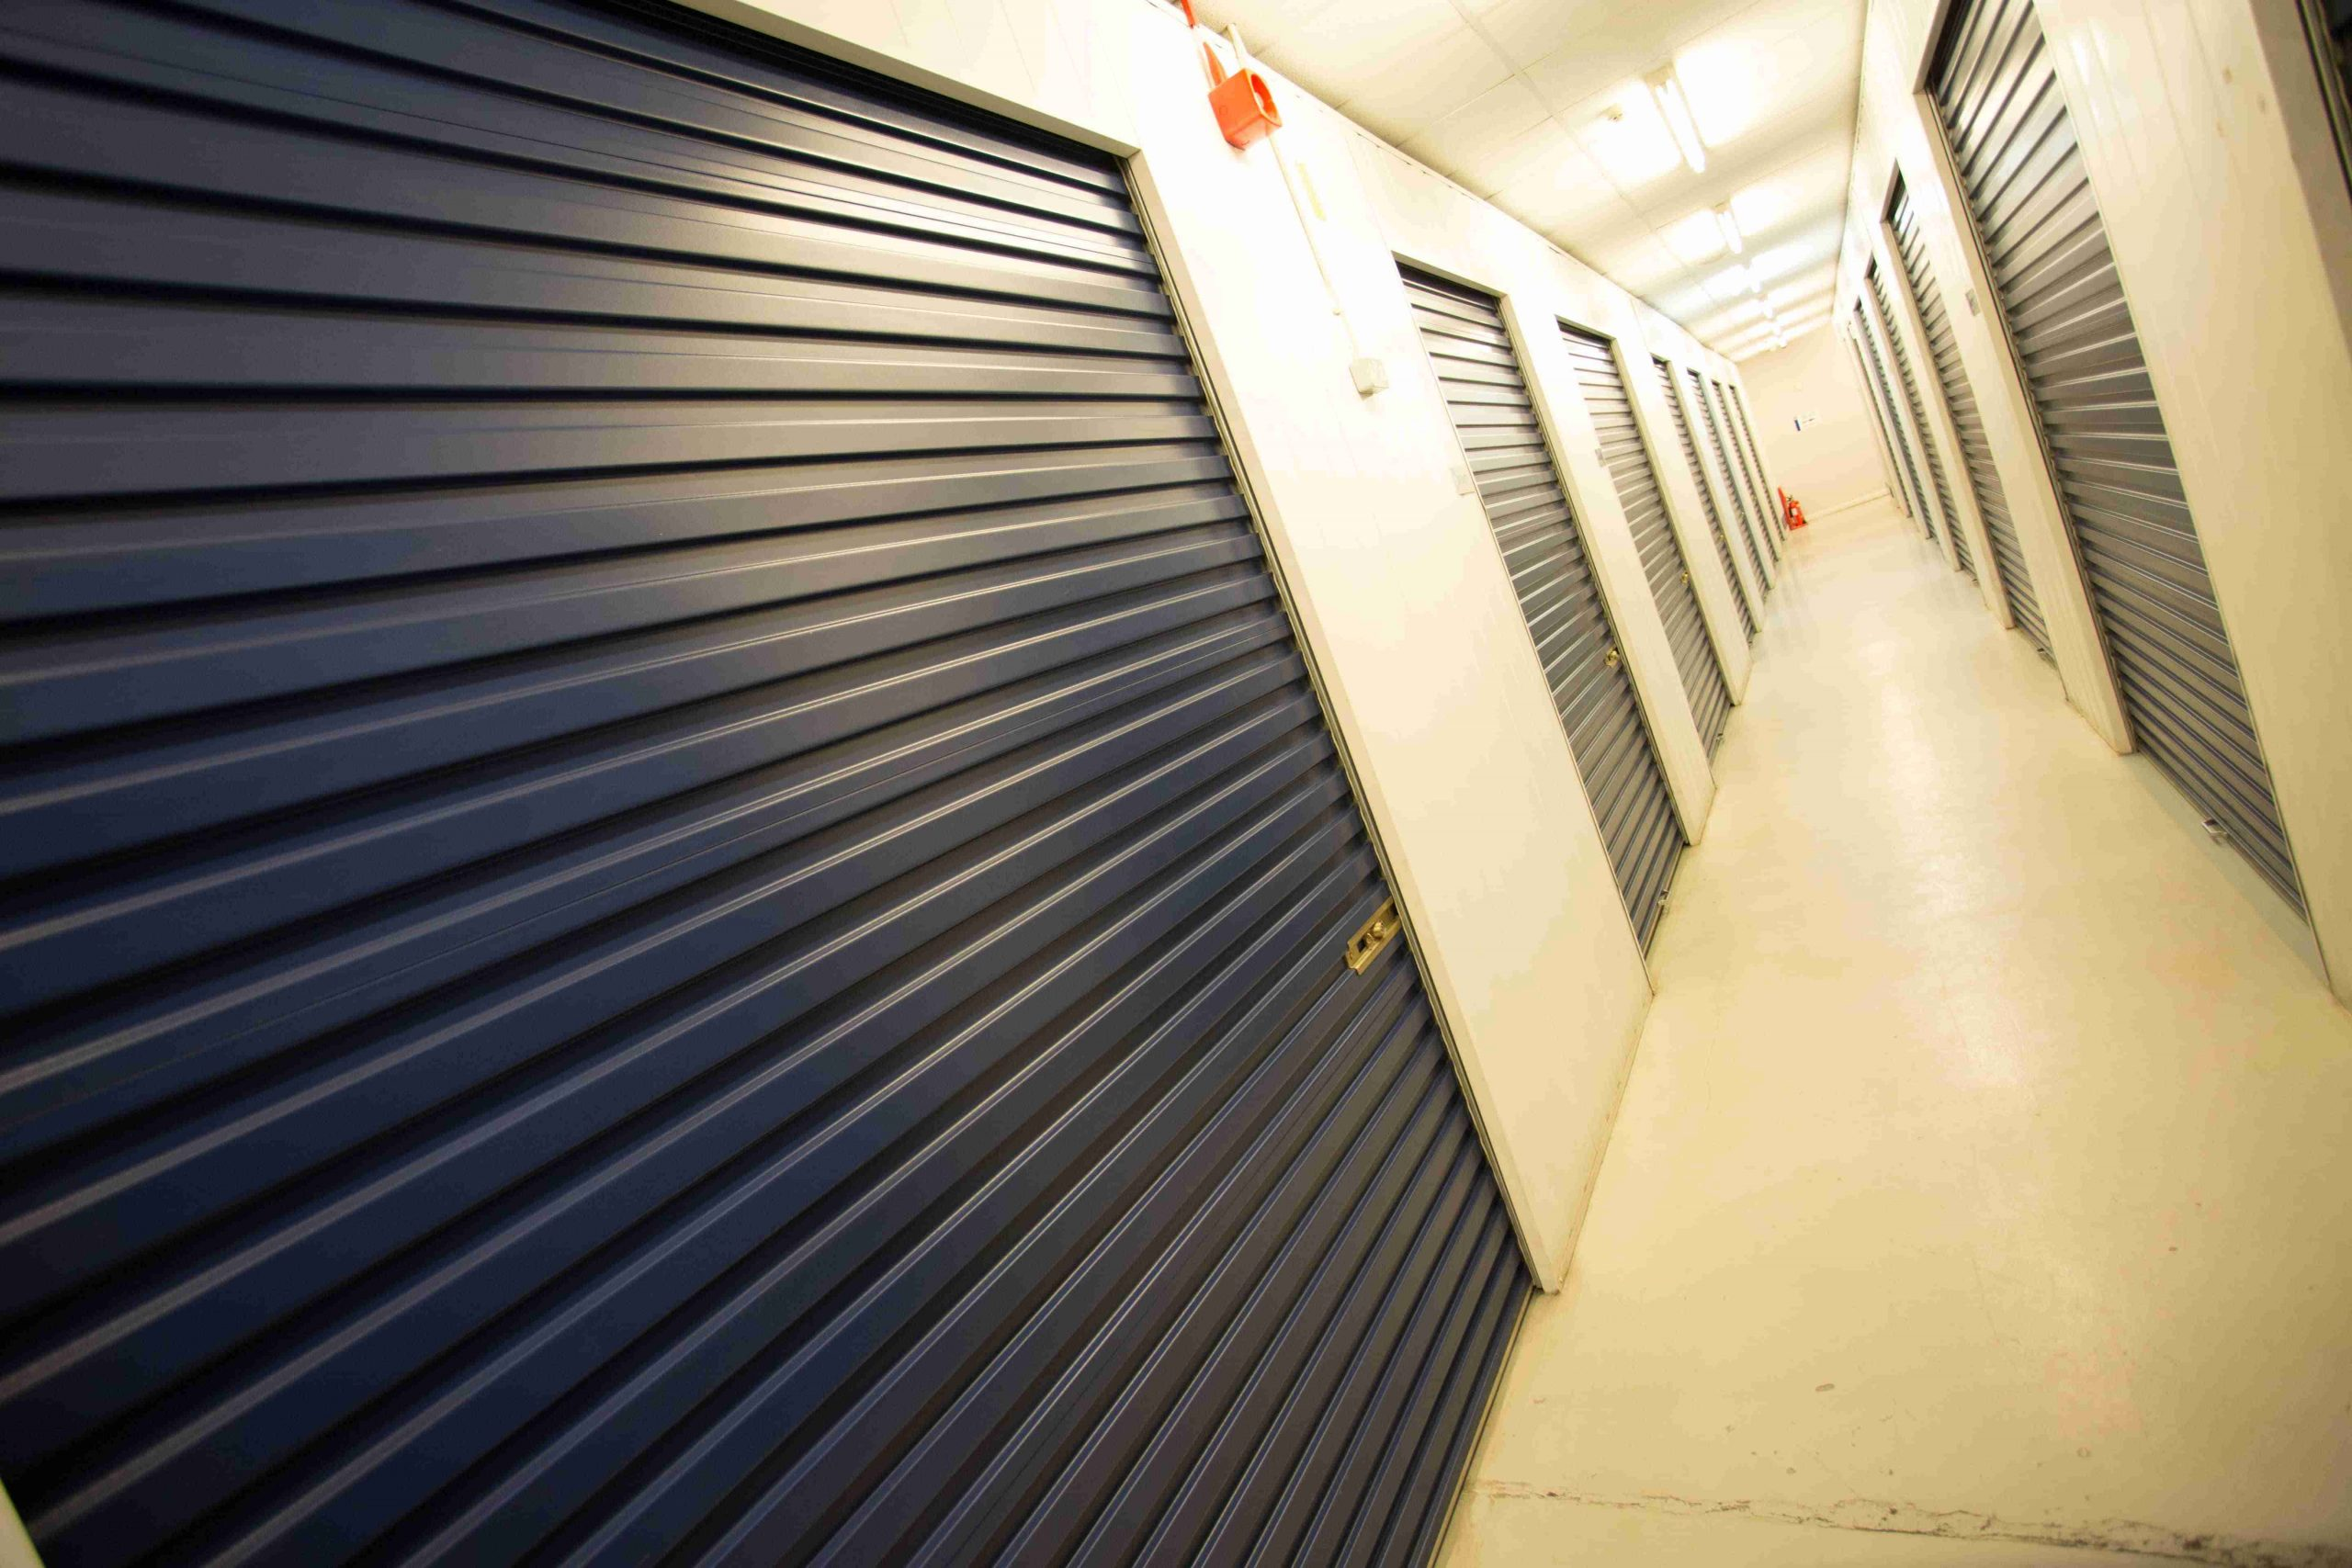 Vanguard Self Storage, Swinton, Manchester a storage company in Lees Street, Swinton, M27 6db, Manchester, UK